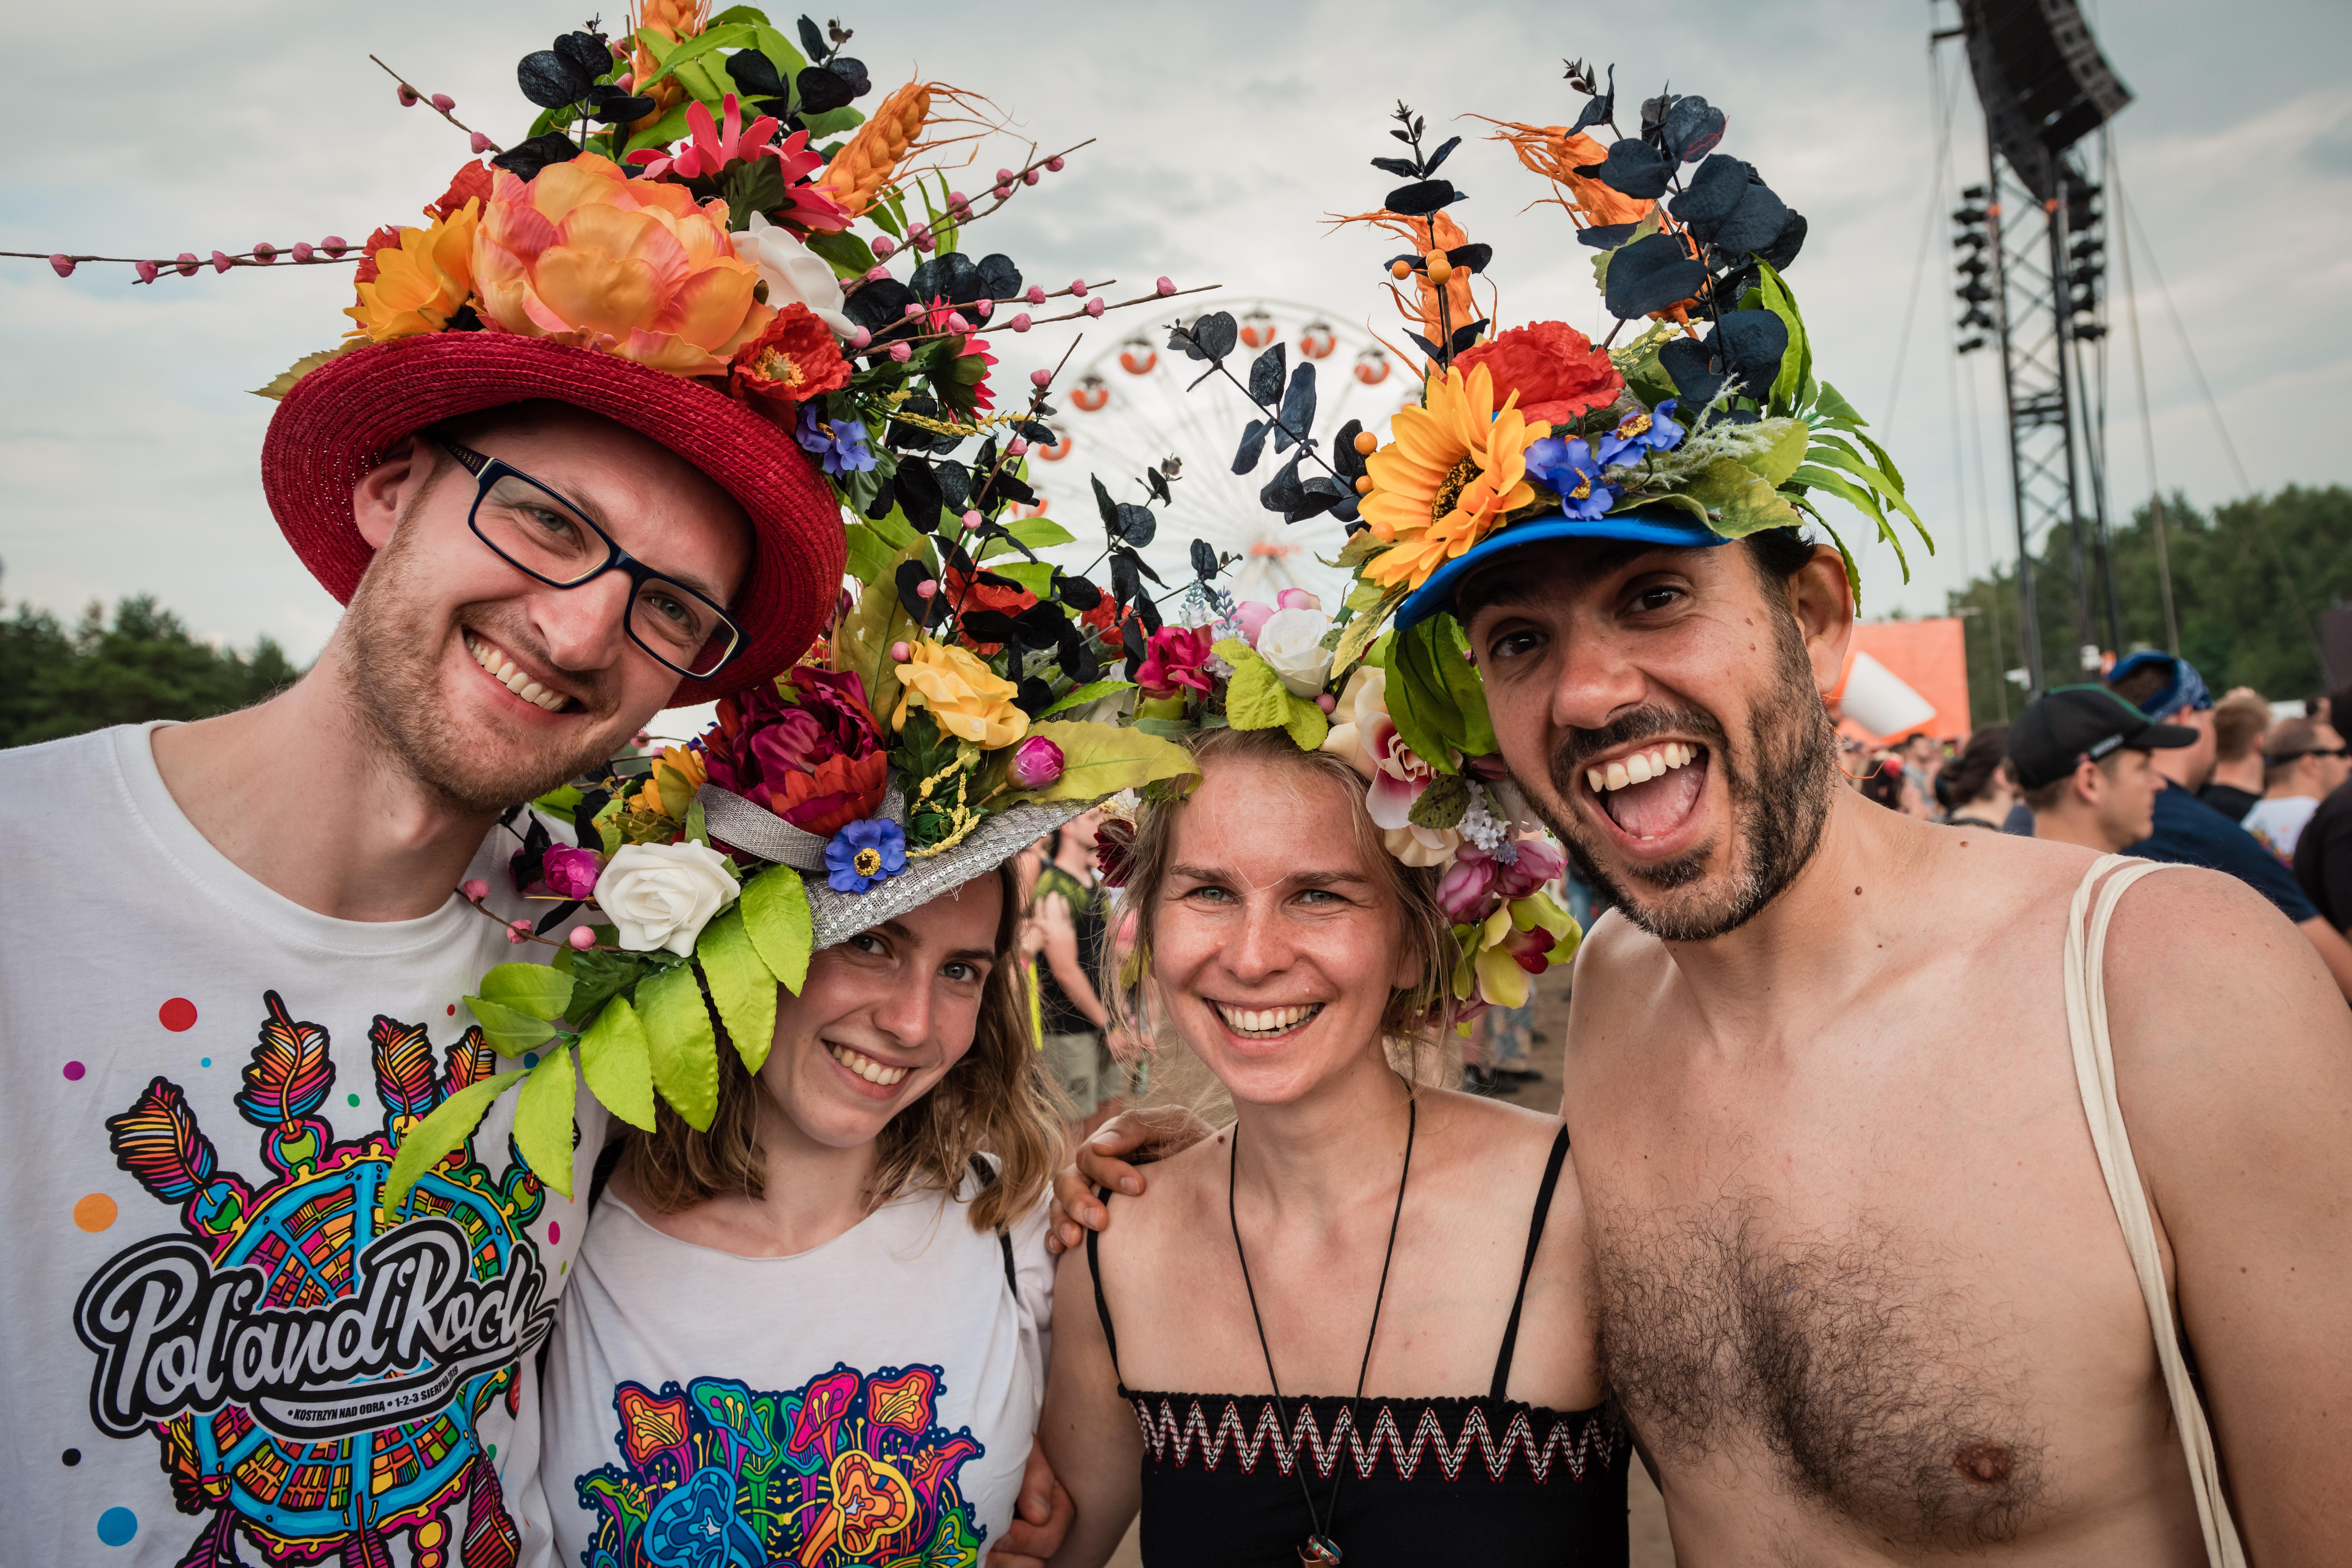 Pol'and'Rock festival goers, Photographer Marcin Michoń